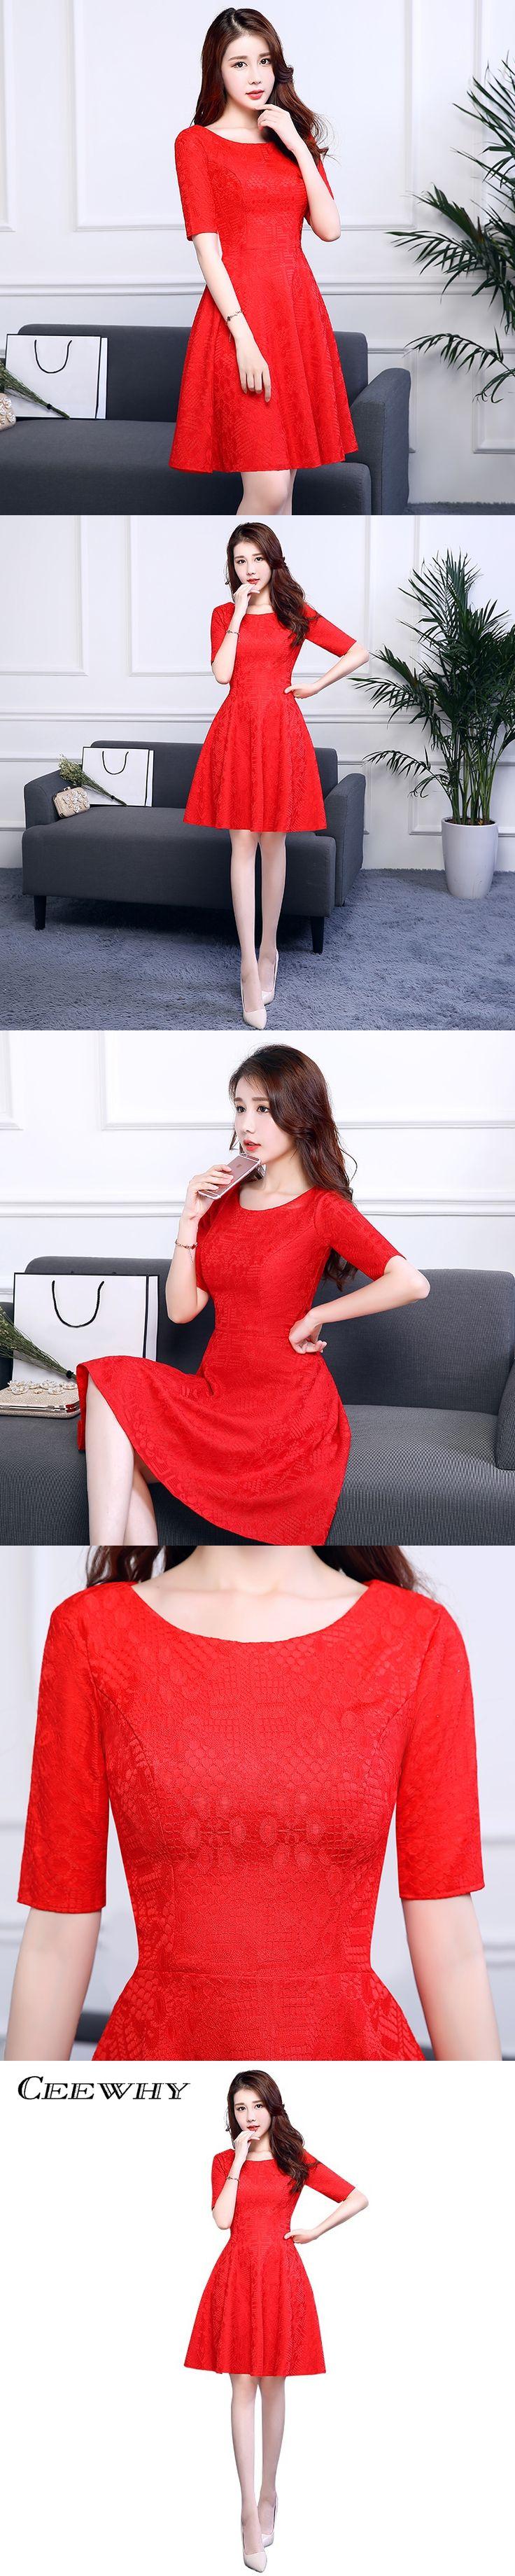 CEEWHY Little Red Dresses Half Sleeve Formal Gown Lace Dress Vestidos de Coctel Elegant Cocktail Dresses Short Prom Dresses